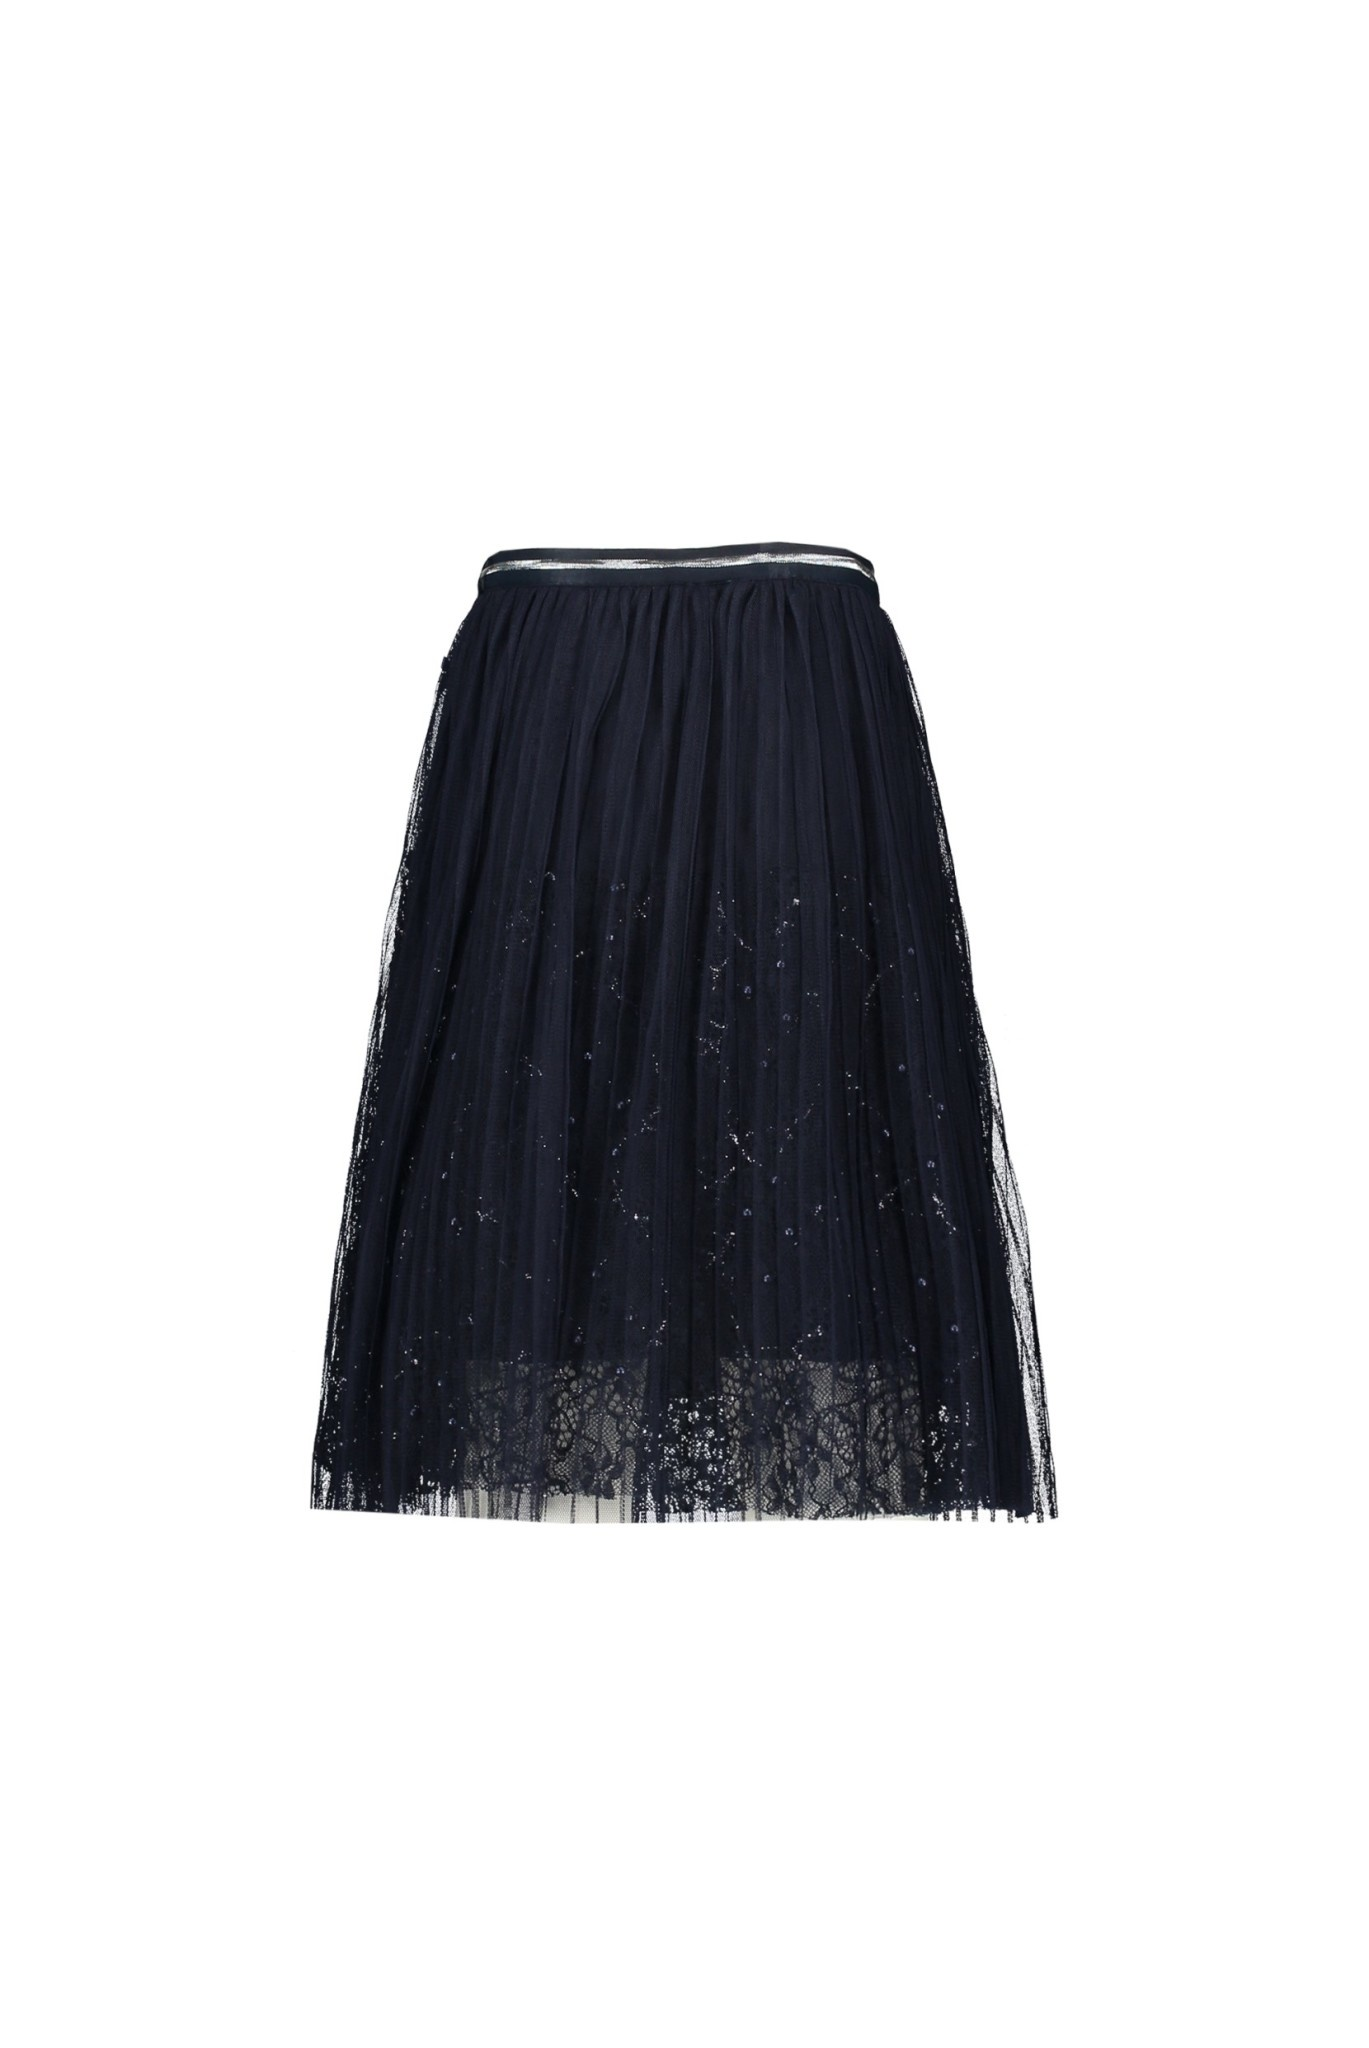 Maribel Long Skirt with Pearls - Navy